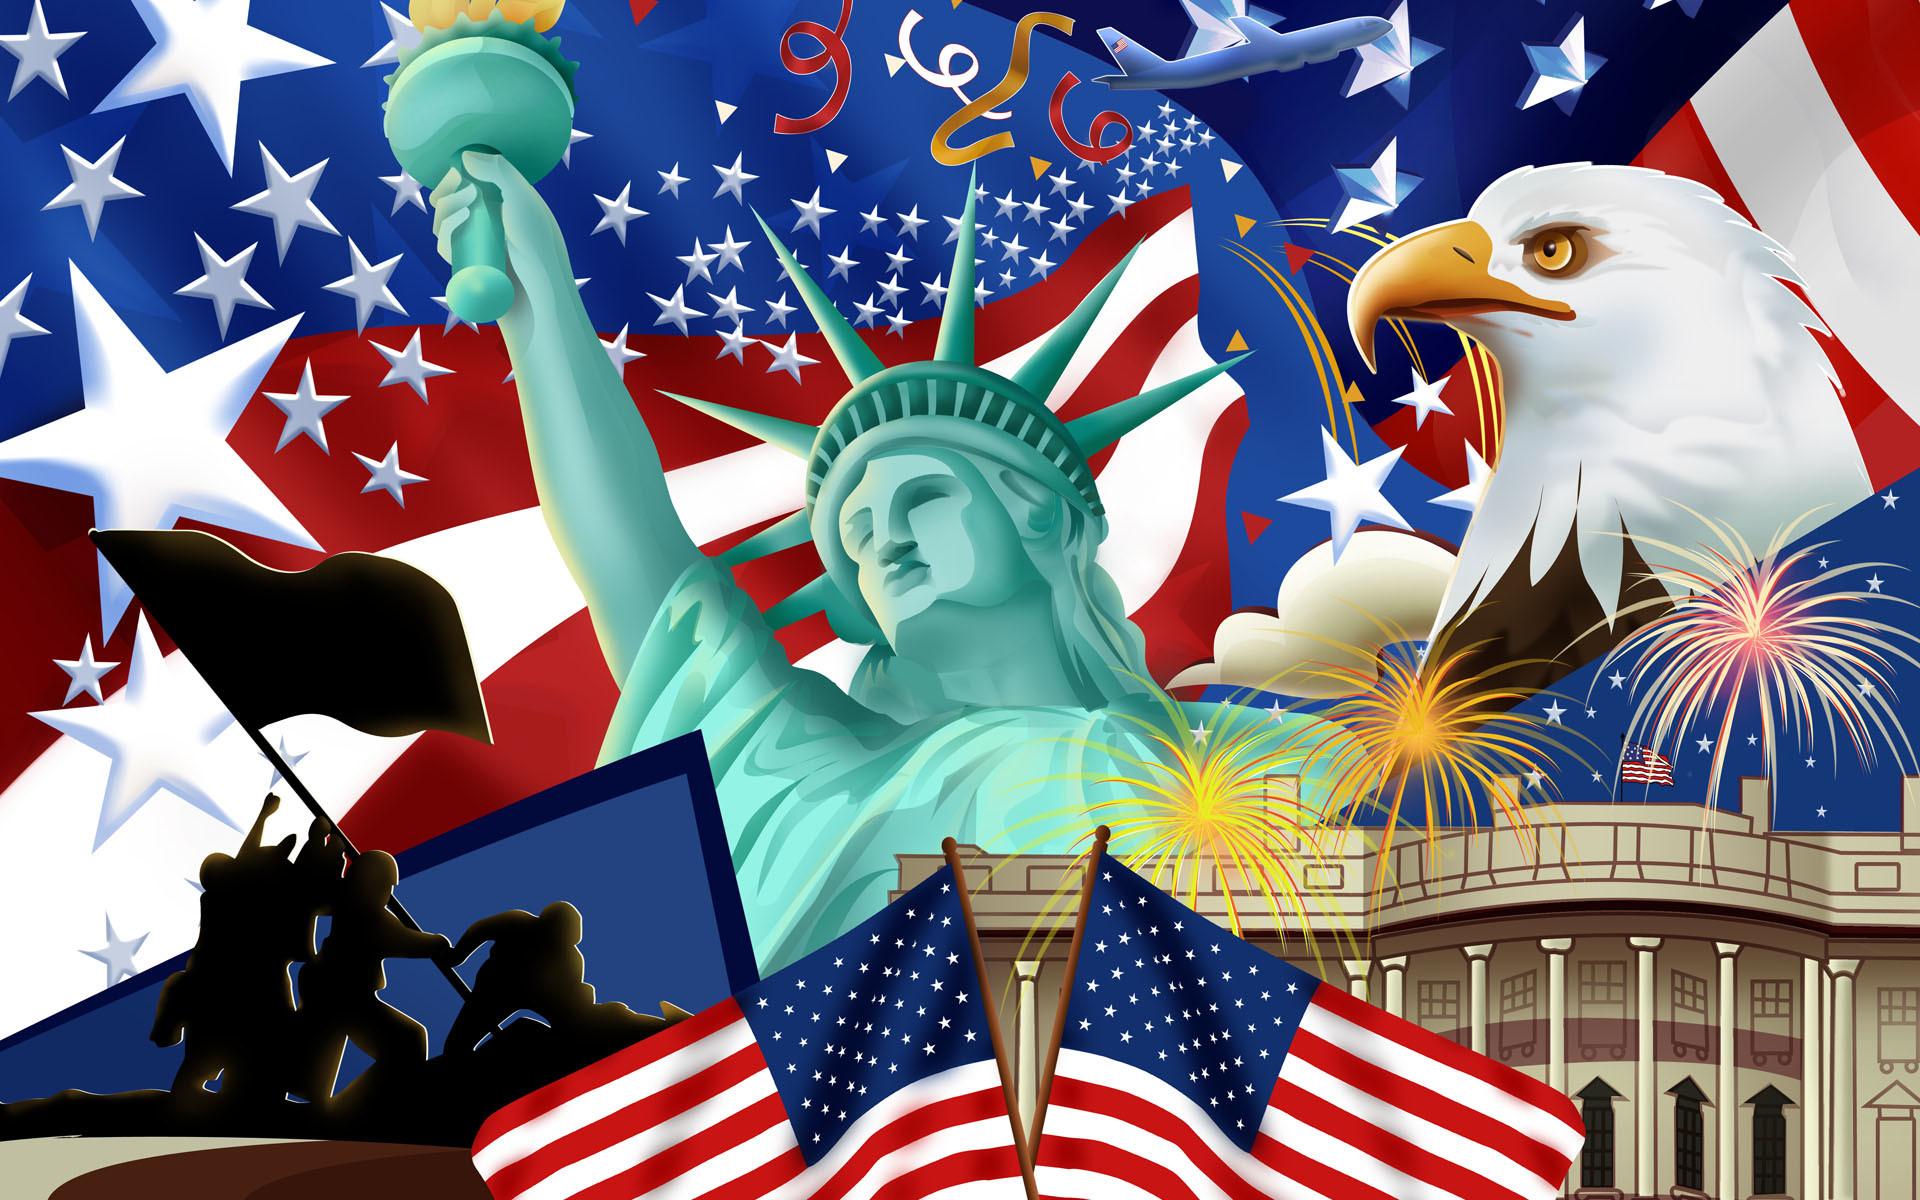 American Flag and Status of Liberty Wallpaper HD.